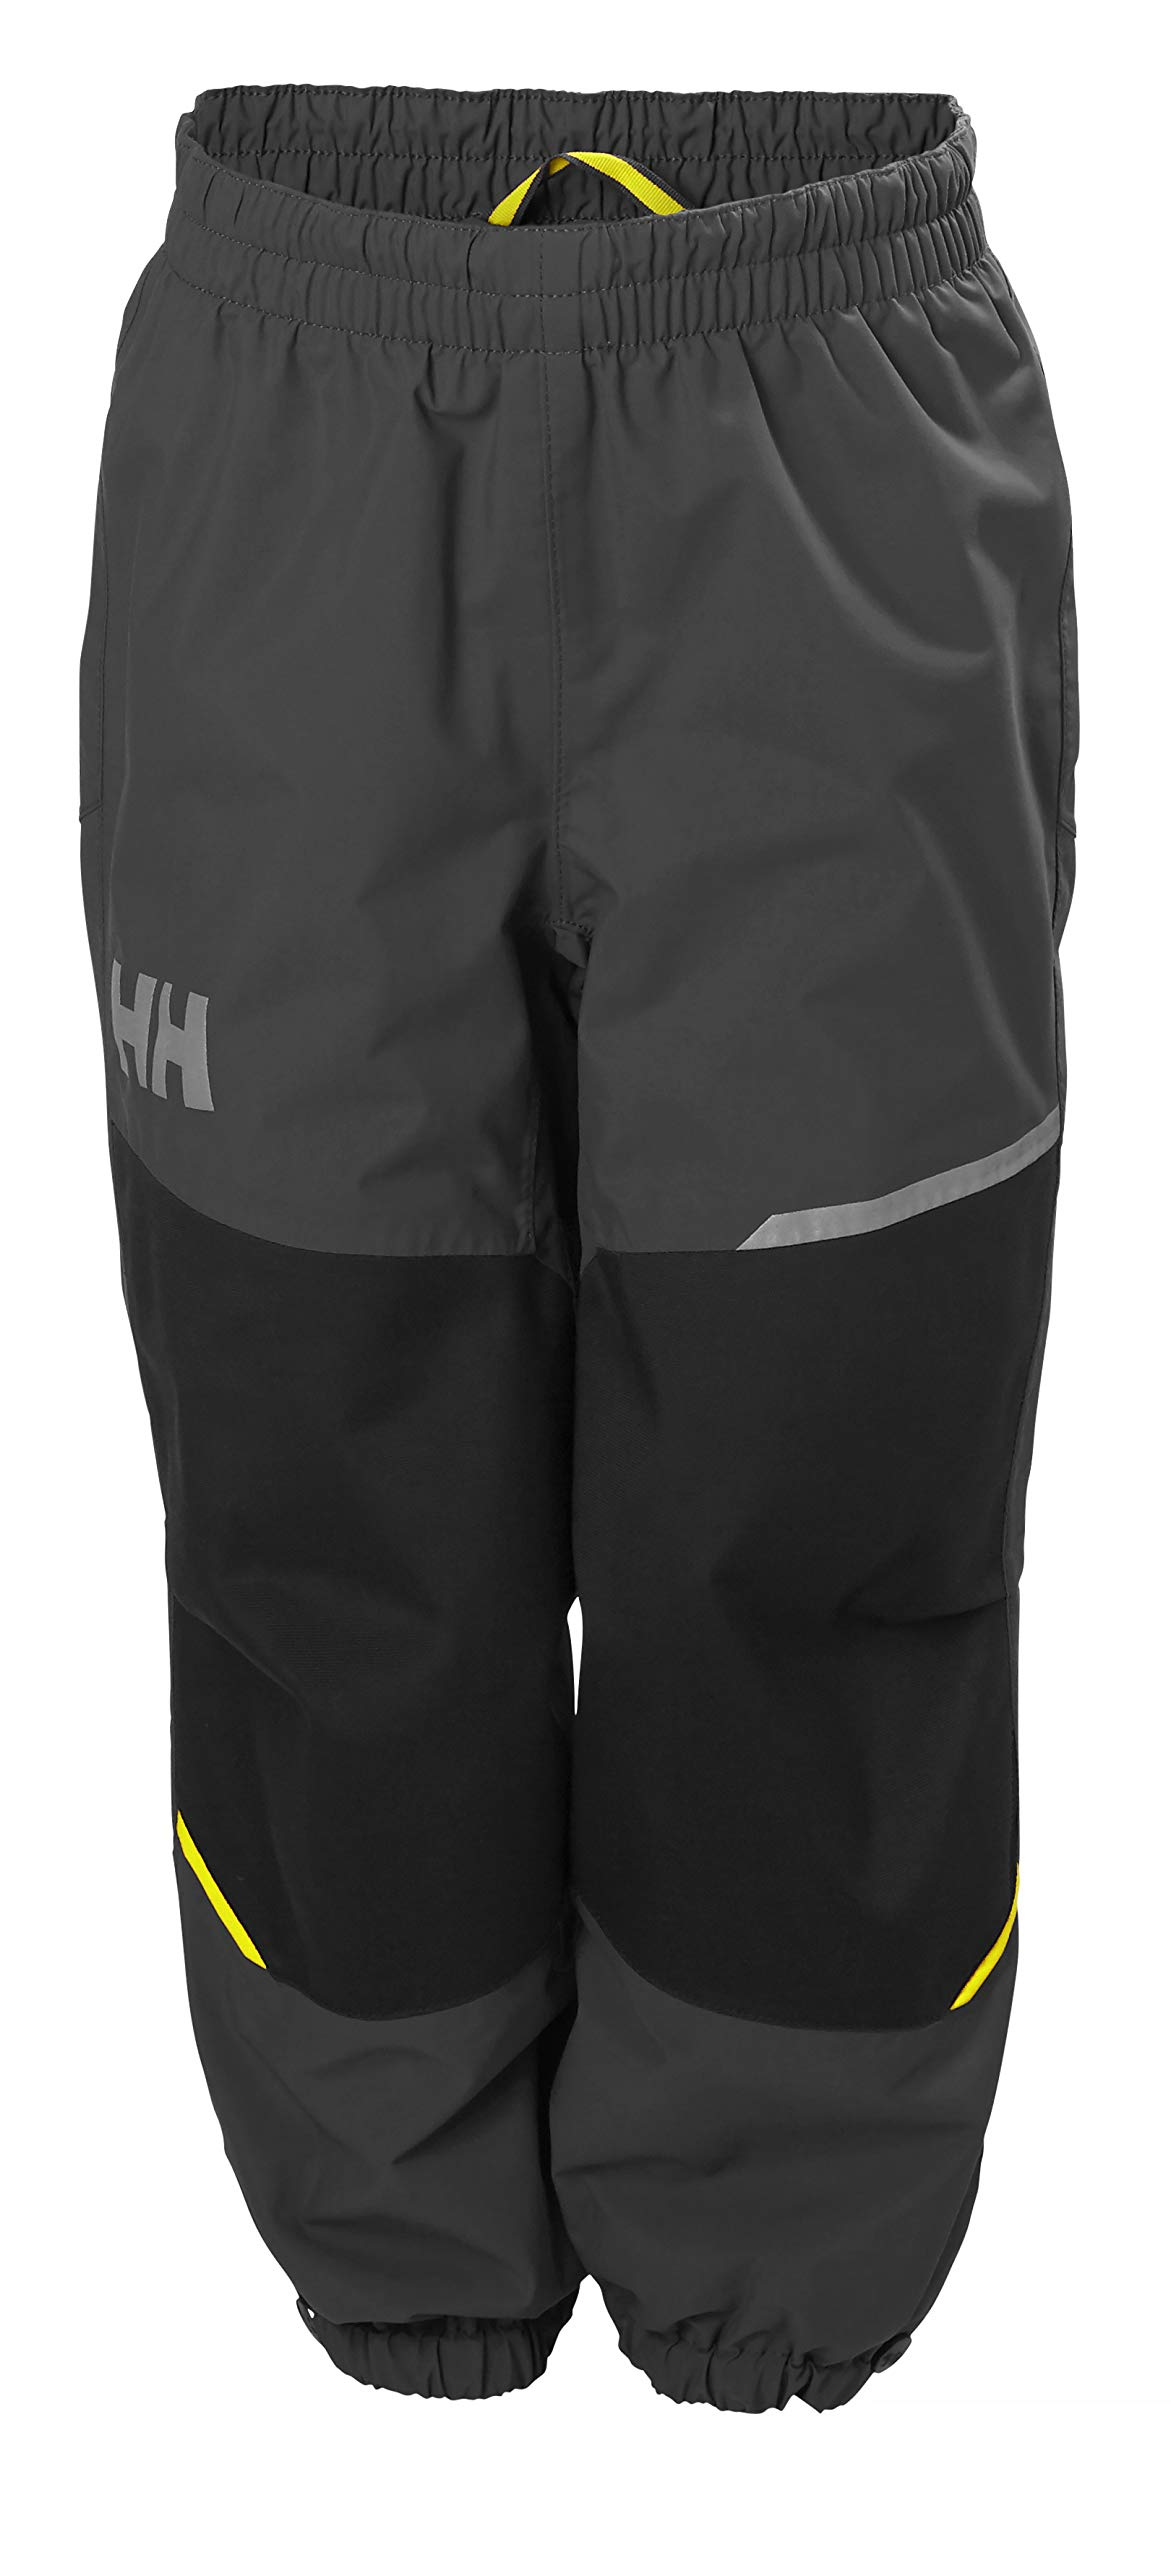 Helly Hansen Juniors Norse Waterproof Breathable Rain Pant, Ebony, Size 4 by Helly Hansen